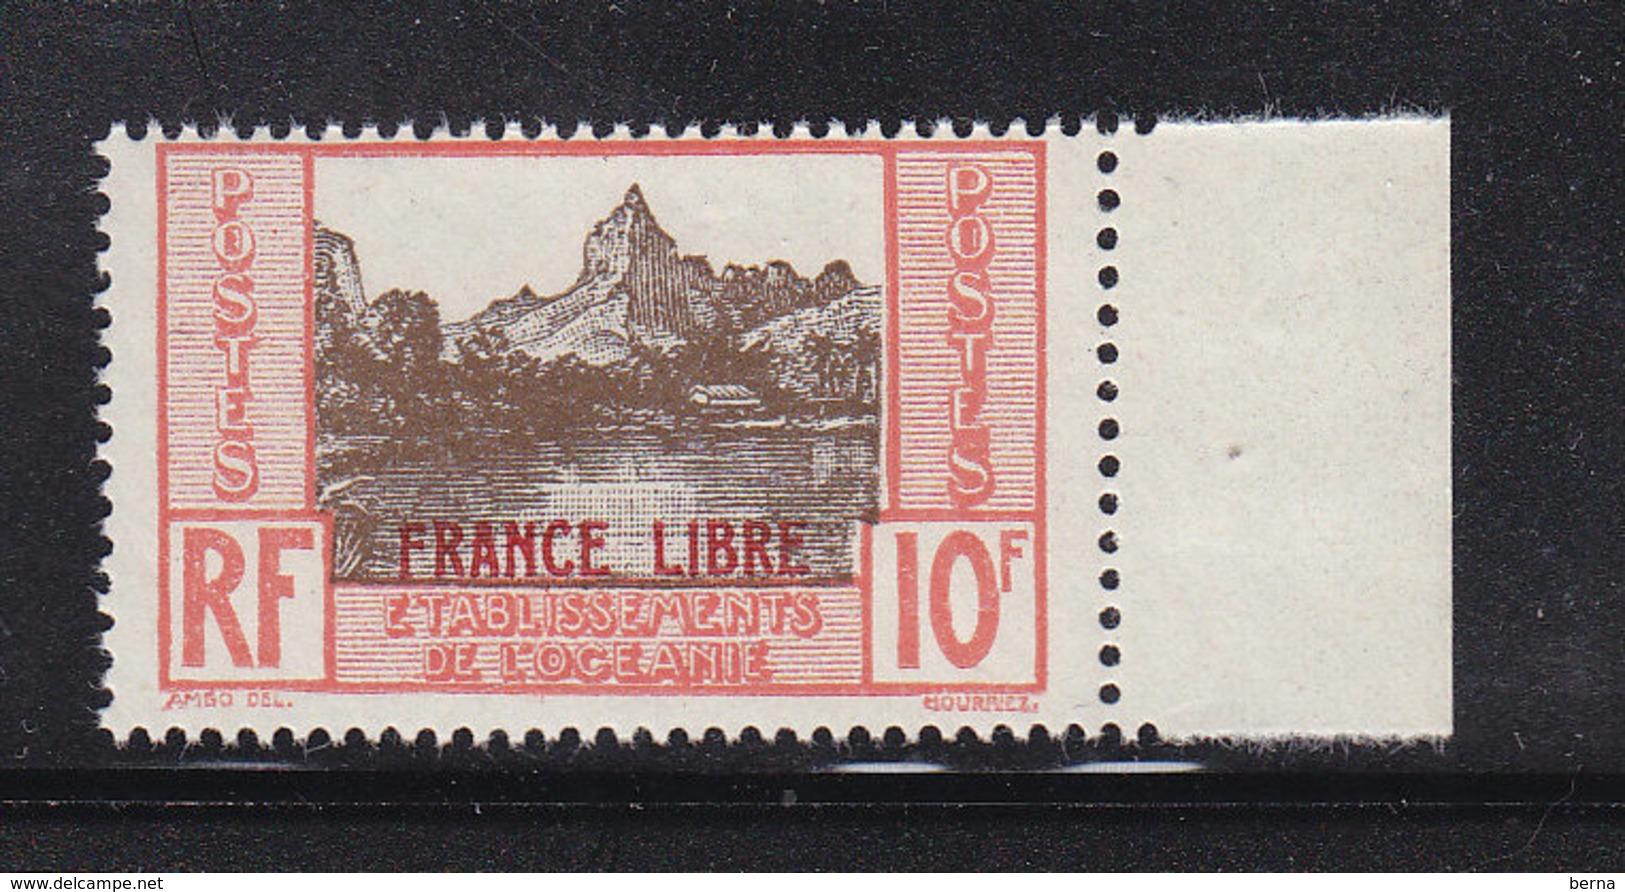 OCEANIE 142 FRANCE LIBRE LUXE NEUF SANS CHARNIERE - Oceania (1892-1958)